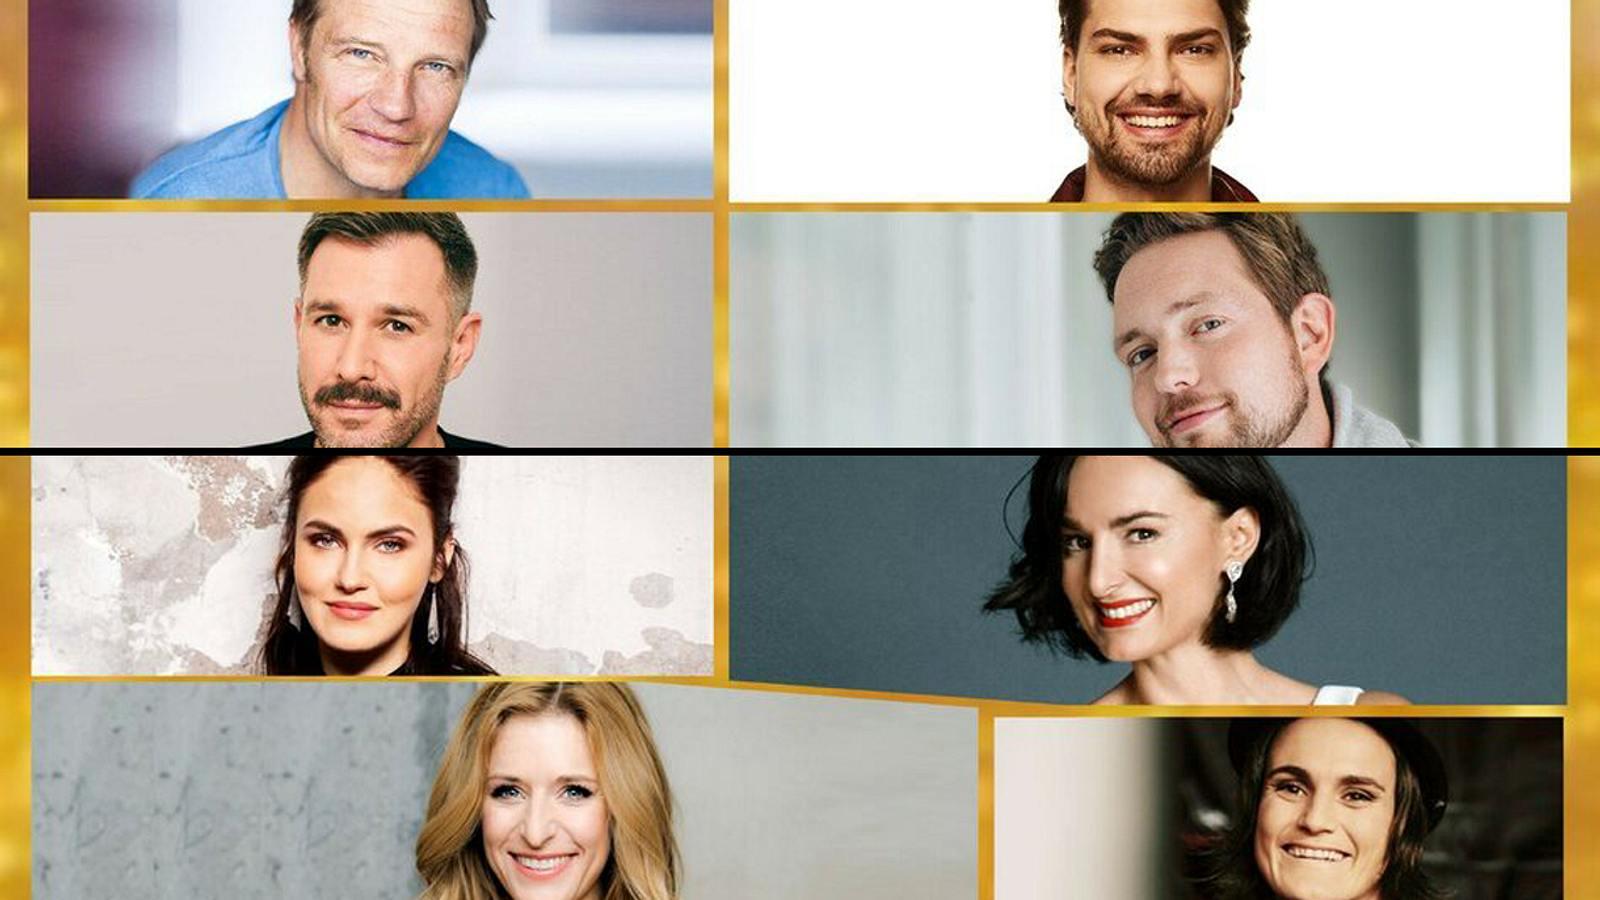 Showtime of my life: Vox lässt 16 Promis blank ziehen